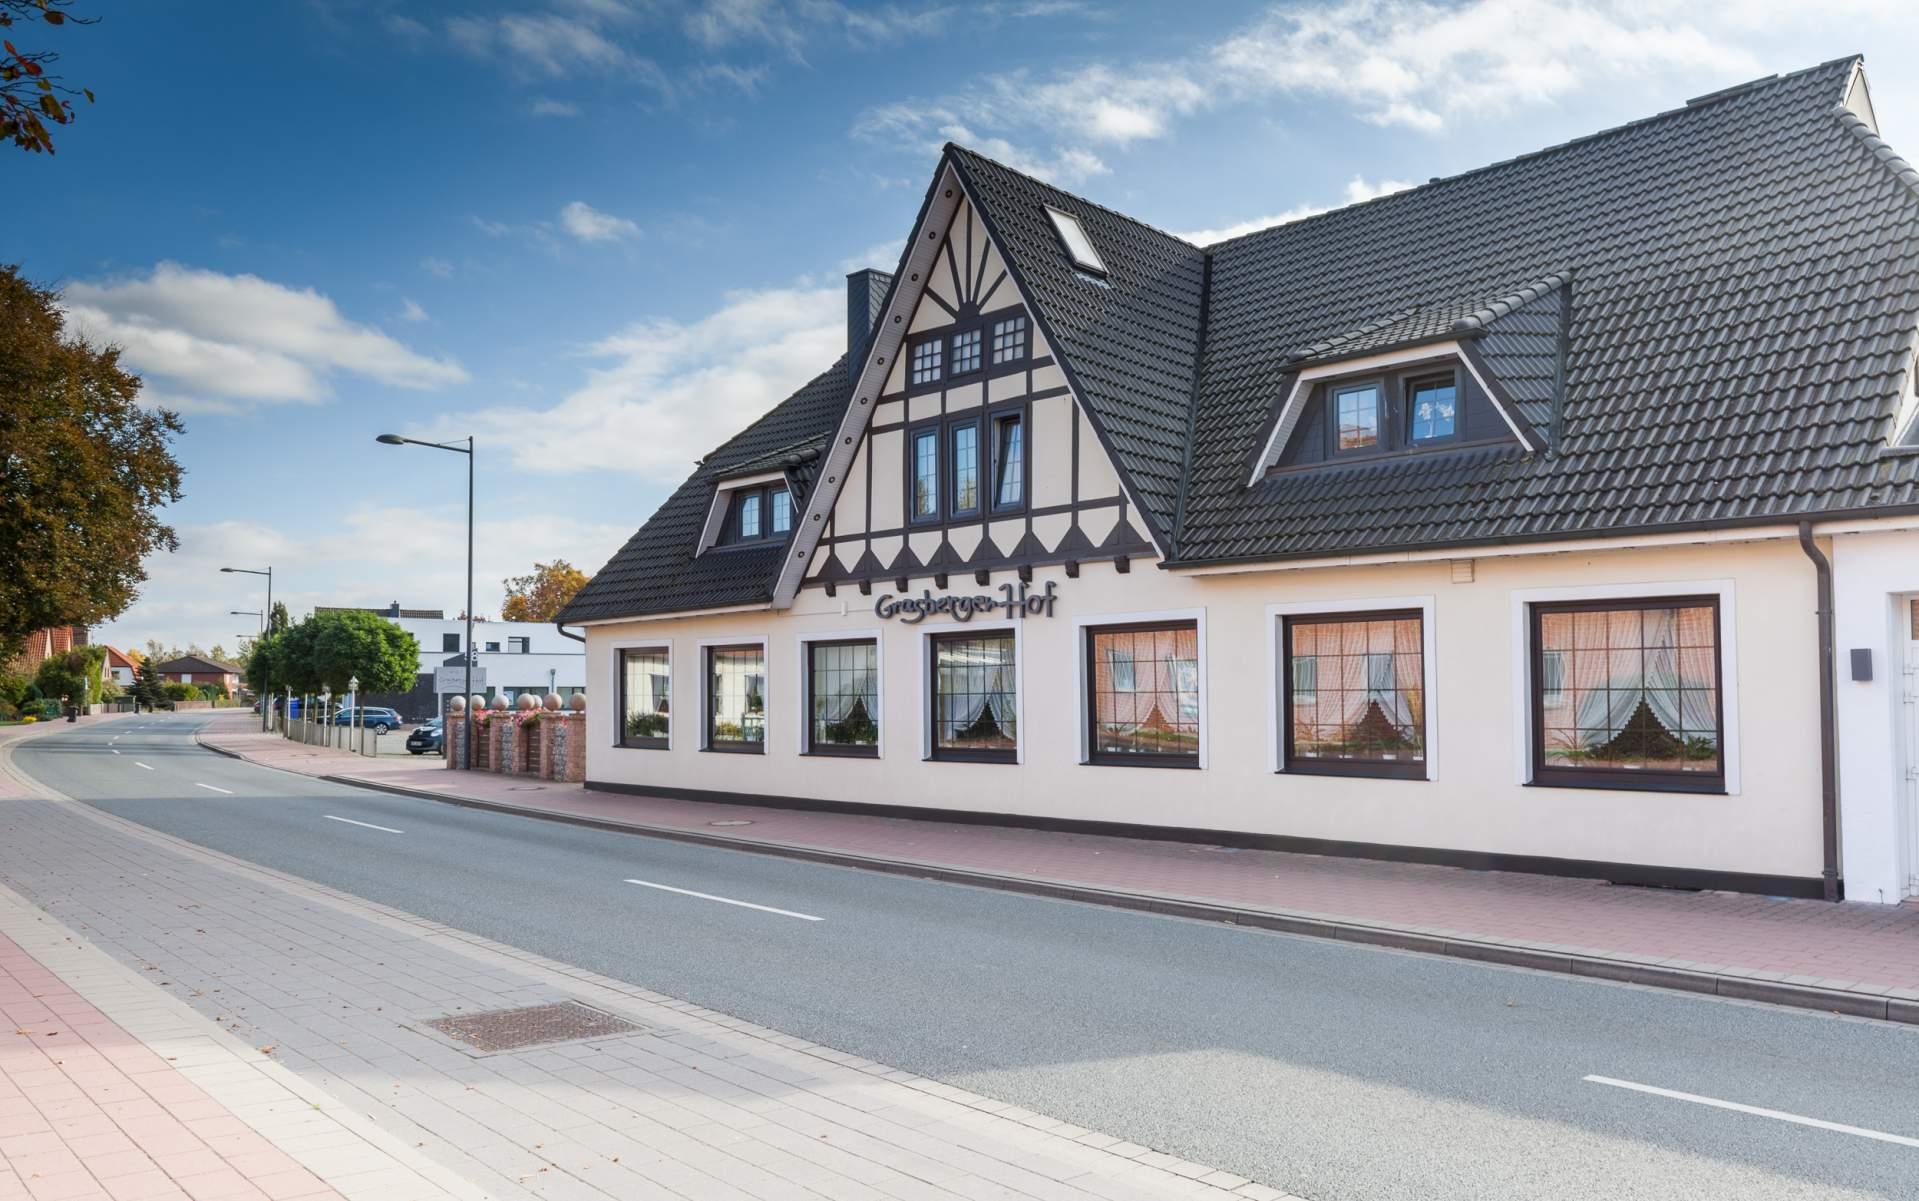 Gebäude Grasberger Hof